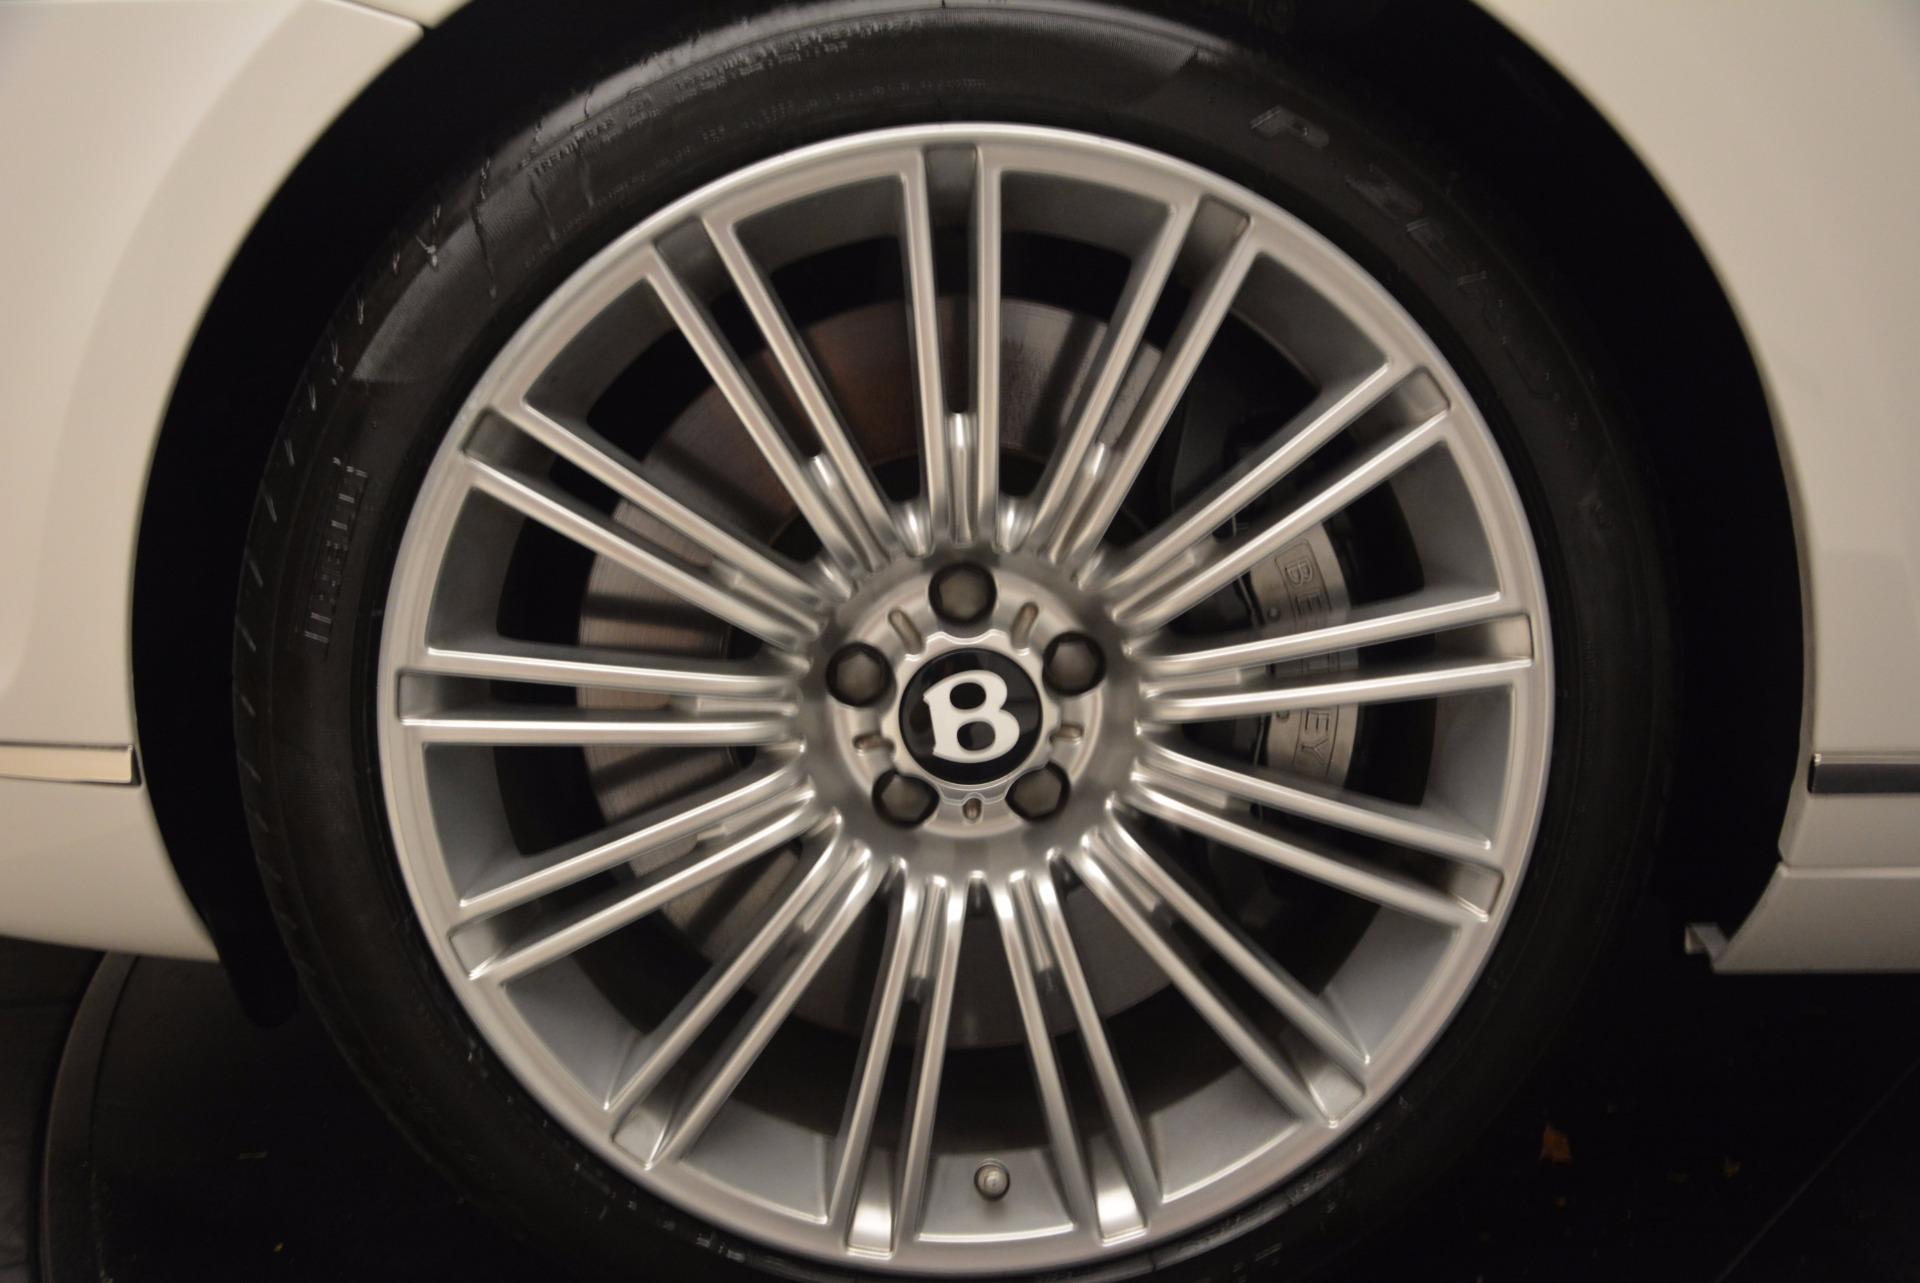 Used 2008 Bentley Continental GT Speed For Sale In Westport, CT 1552_p17